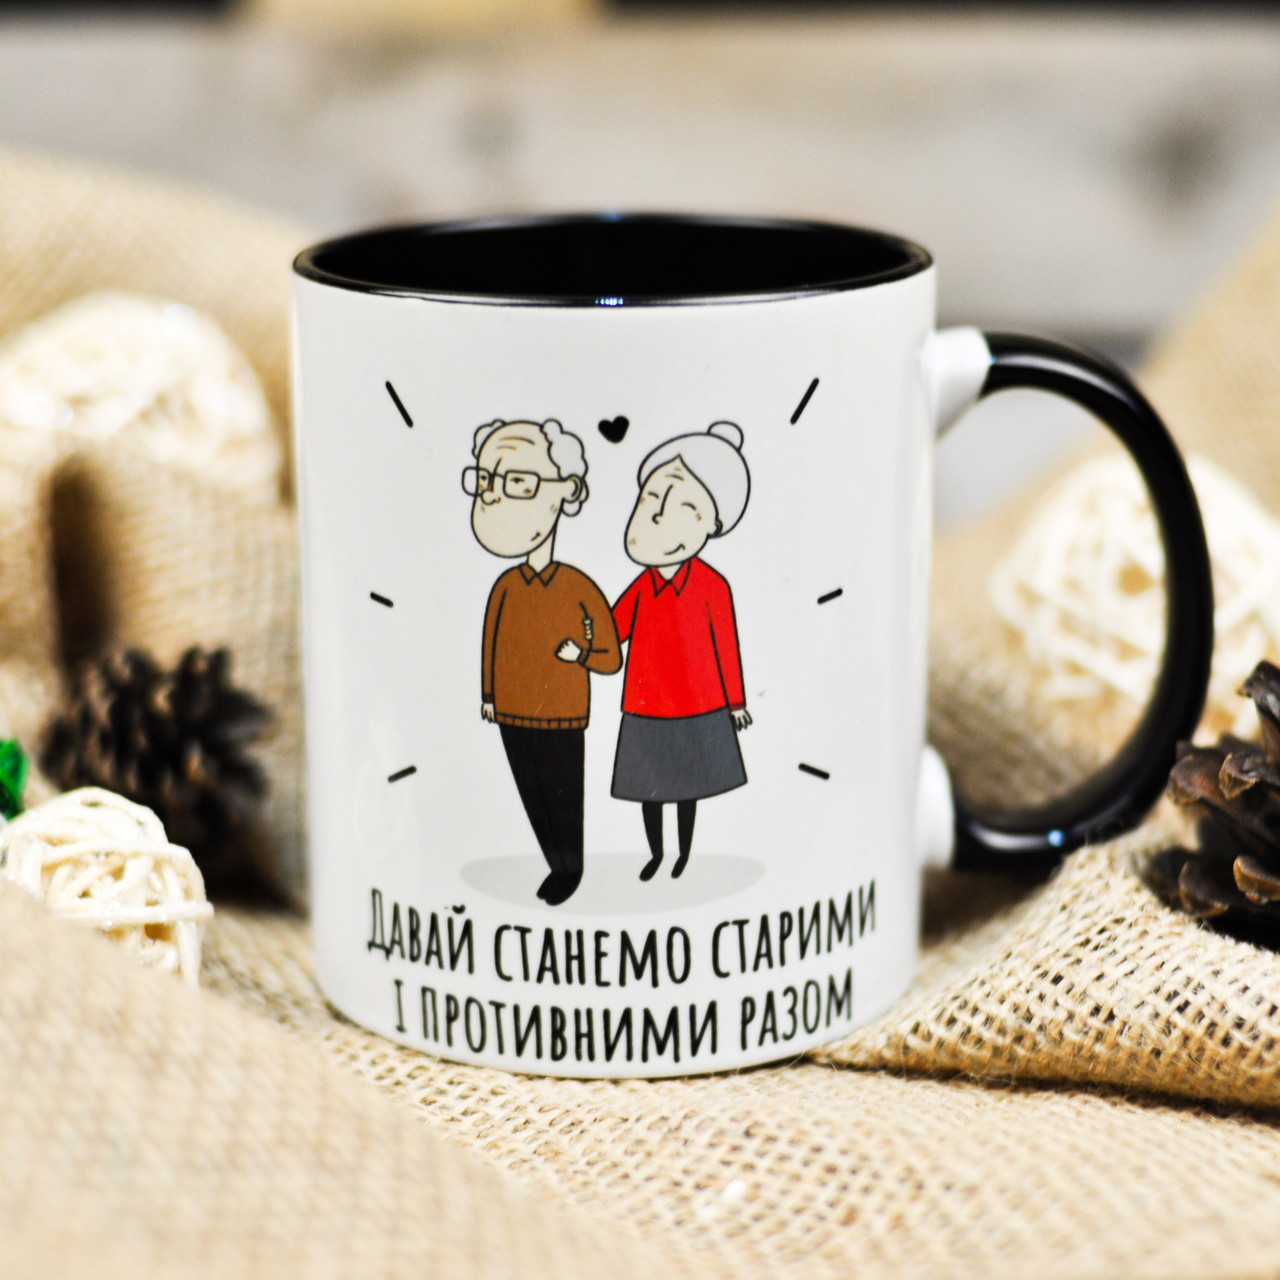 "Чашка з принтом  ""Давай станемо старими разом"""